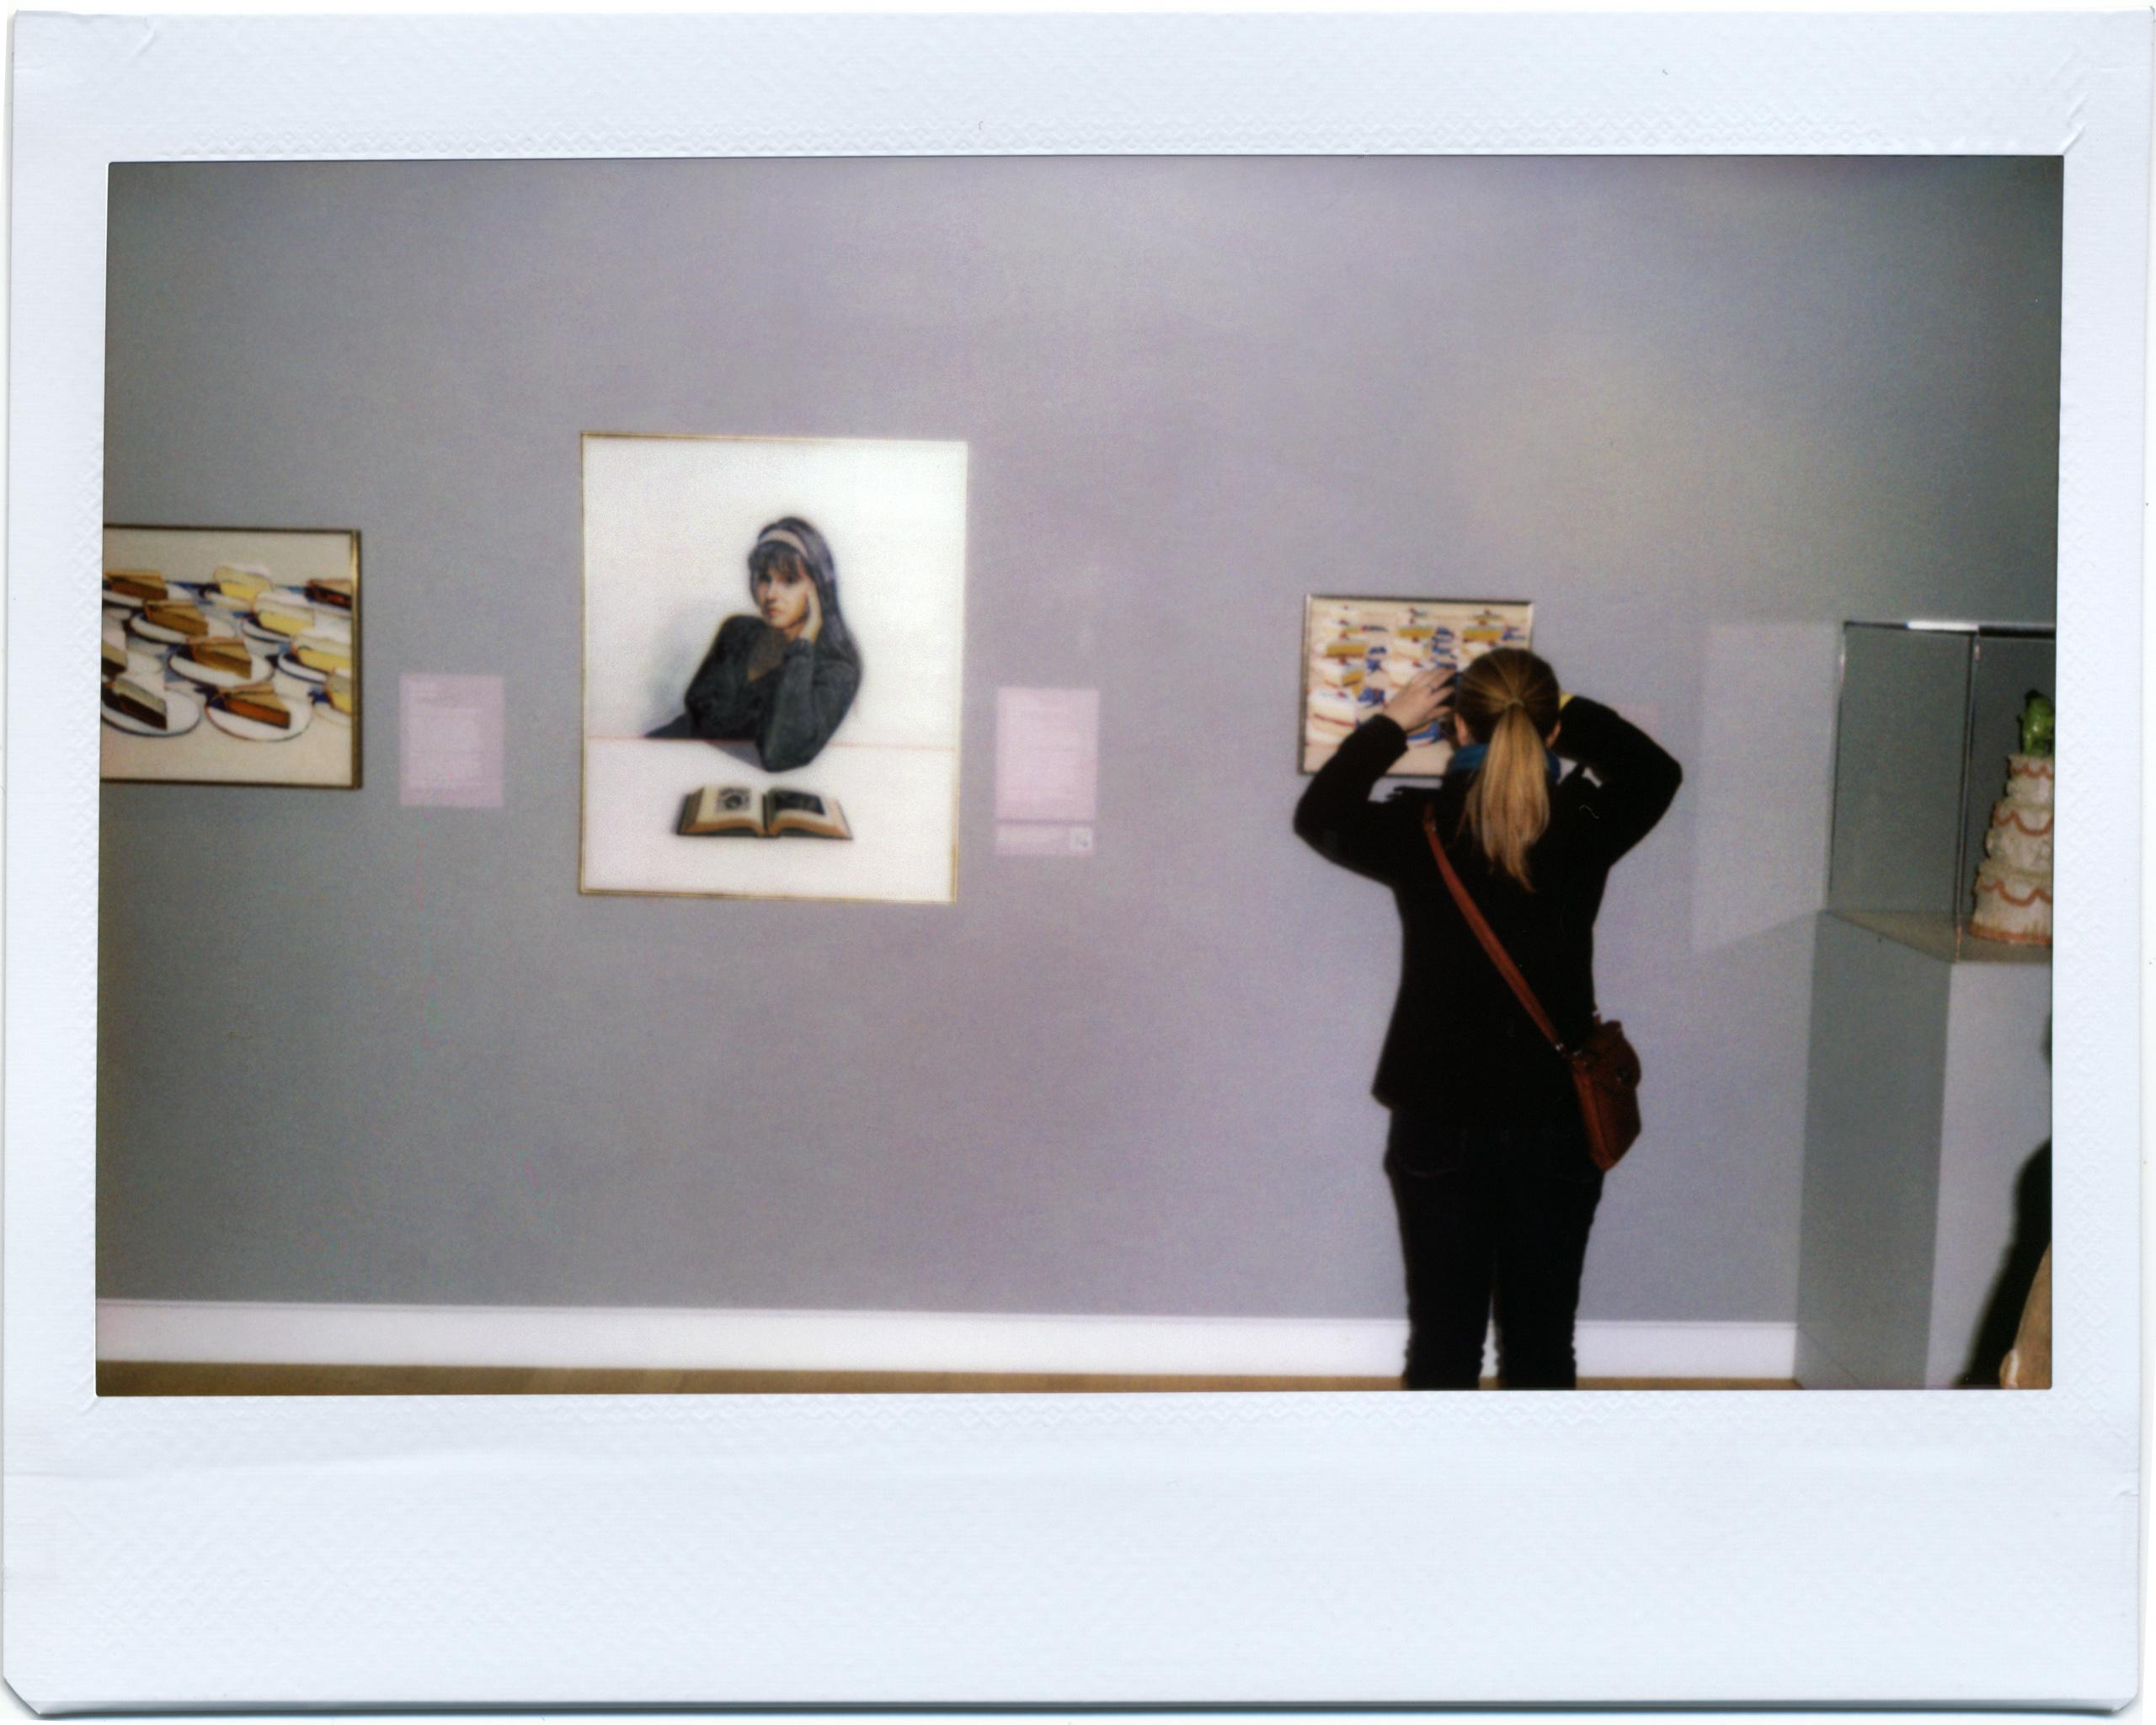 Fotos gratis : mujer, museo, pintura, marca, art, marco, exposición ...